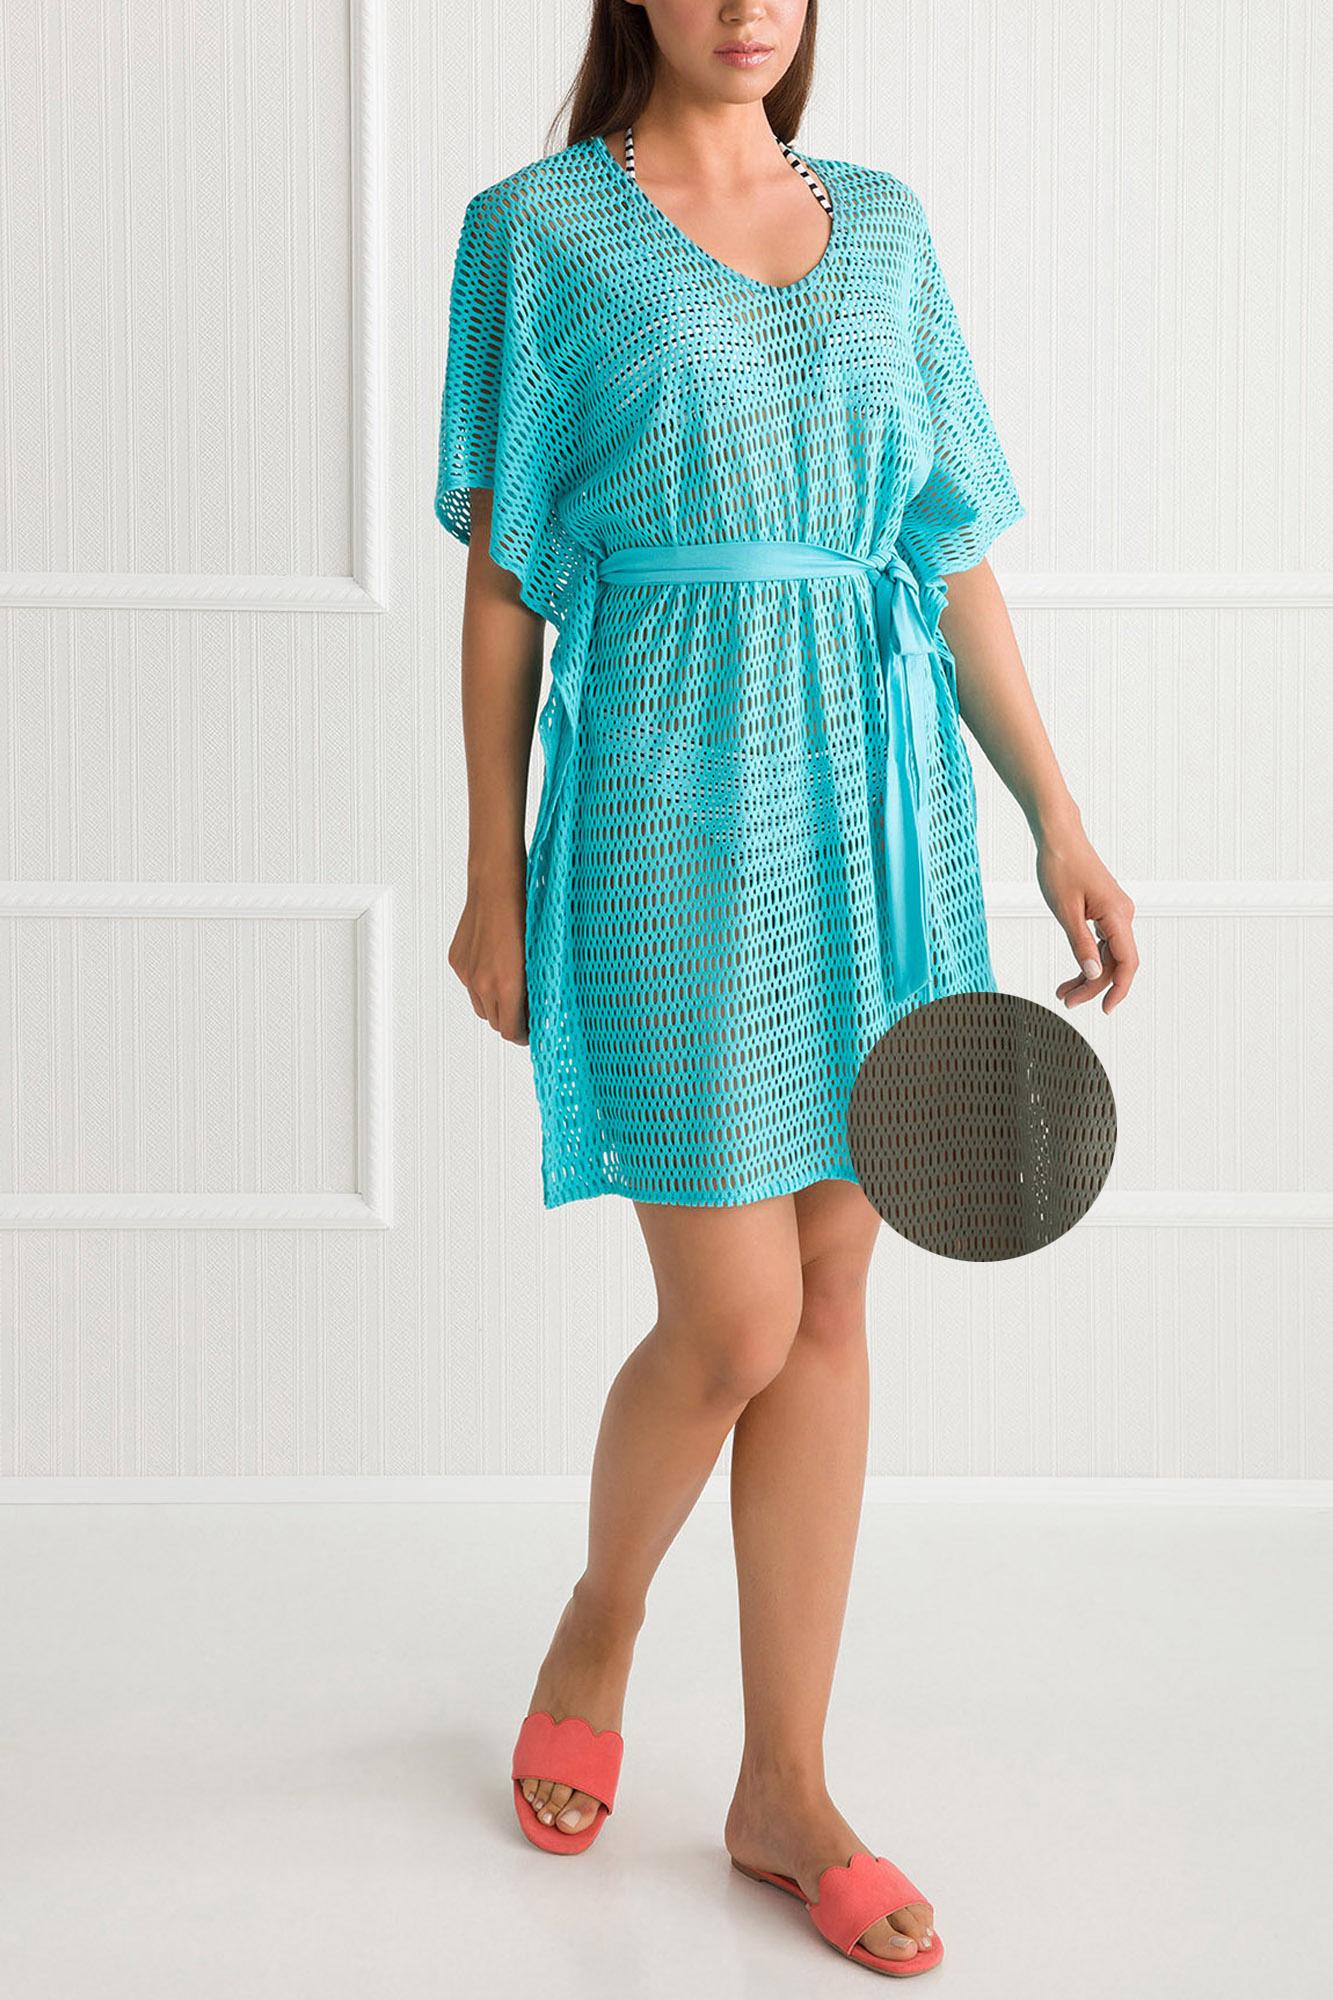 7a19d792abcc Γυναικείο Καφτάνι Vamp - Beachwear Λαδί - Ζακάρ 100% βαμβάκι ...